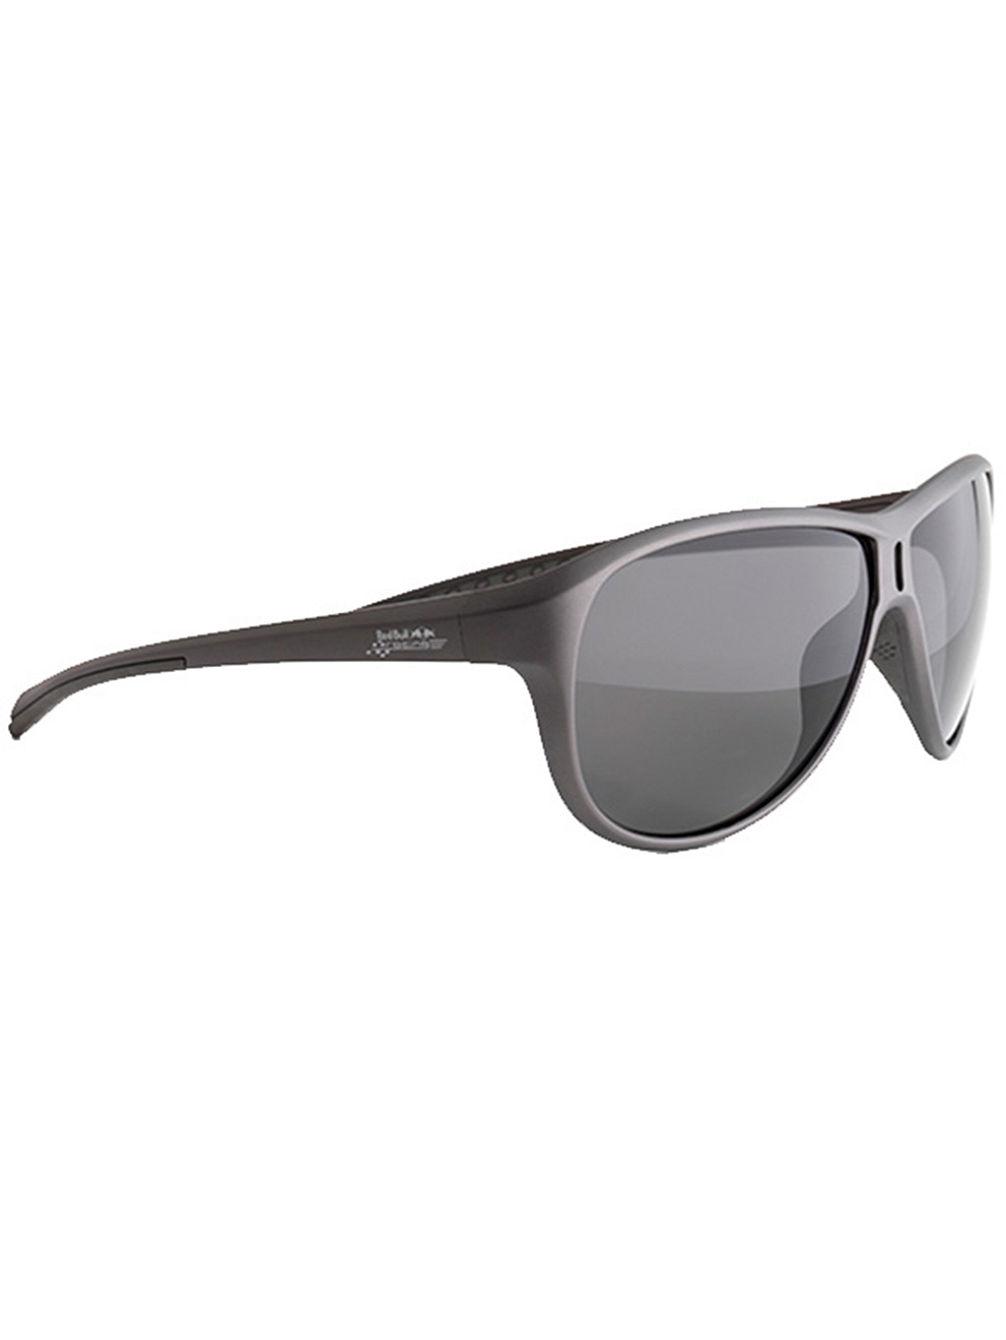 63c70cdfe3f8 Buy Red Bull SPECT Eyewear ATIU metallic matt grey/grey rubber ...